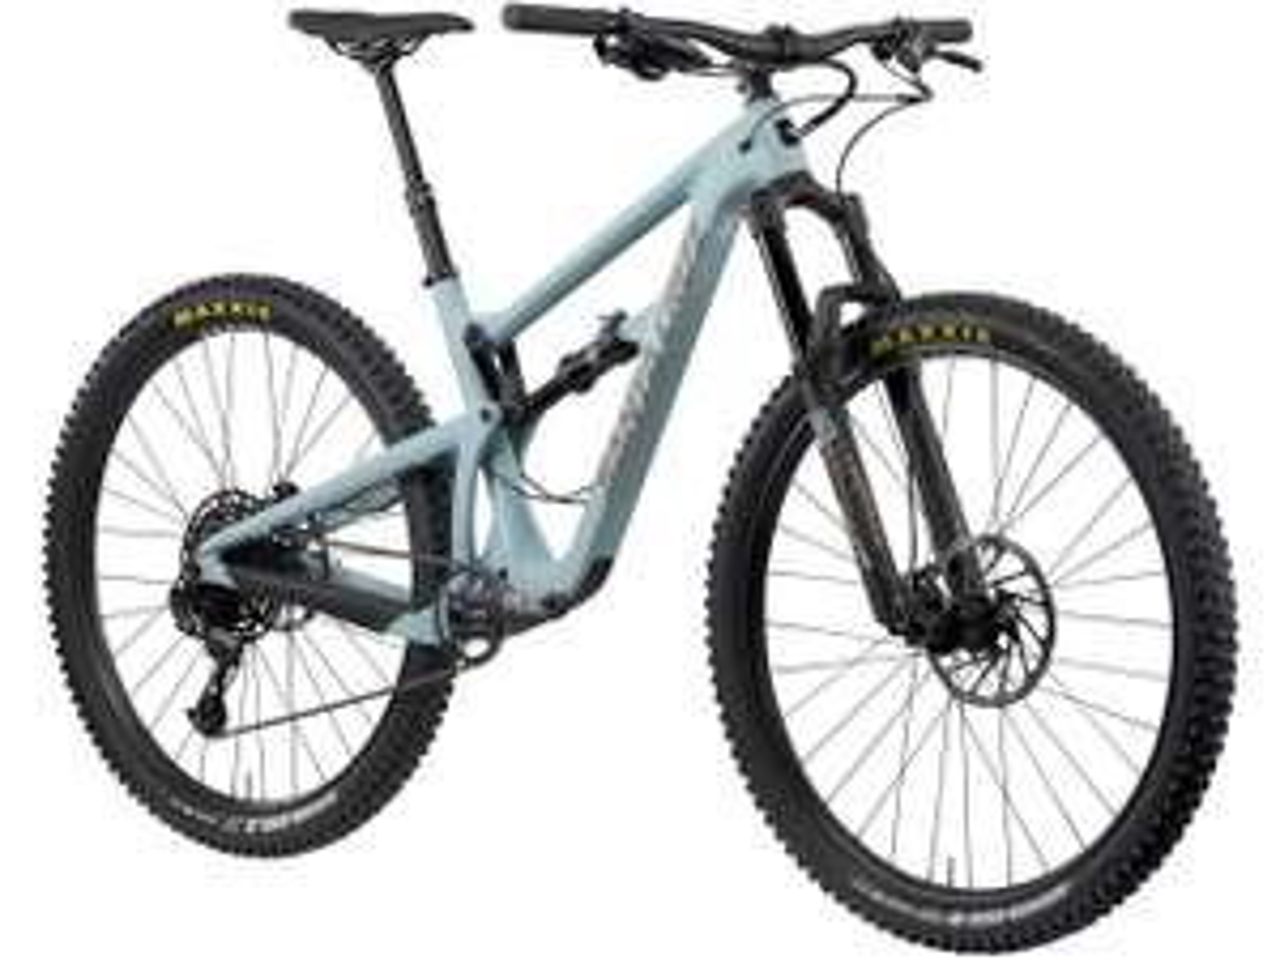 "VTT Enduro 29"" Santa Cruz Vélo Complet Hightower LT 1 (Carbone/Eagle NX) - 2019 (S, M"